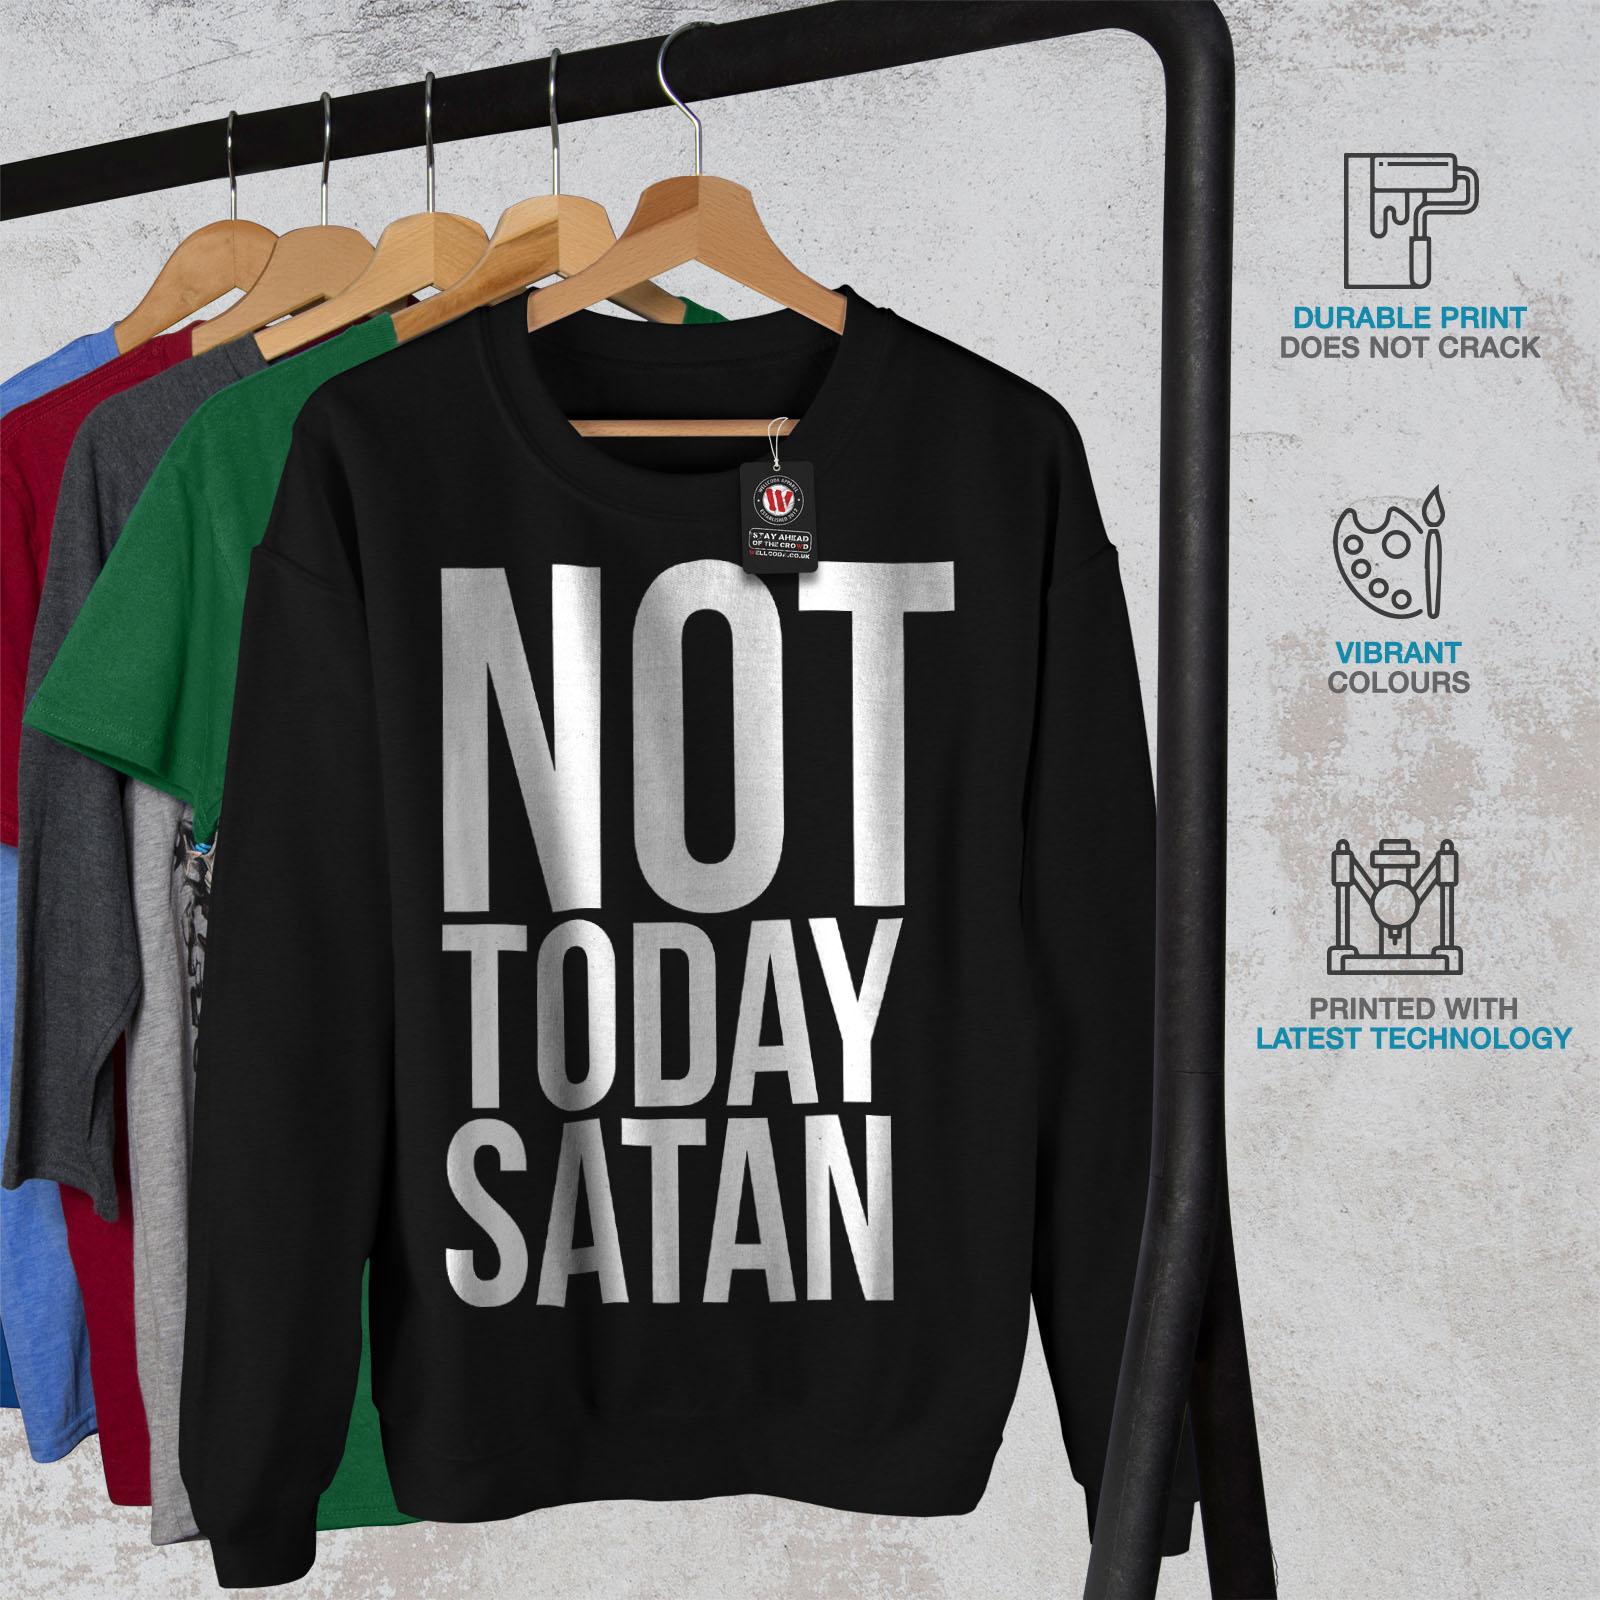 Pullover Wellcoda Occulte Jumper Noir Pas aujourd'hui Sweatshirt Hommes Satan qGzUMpSV